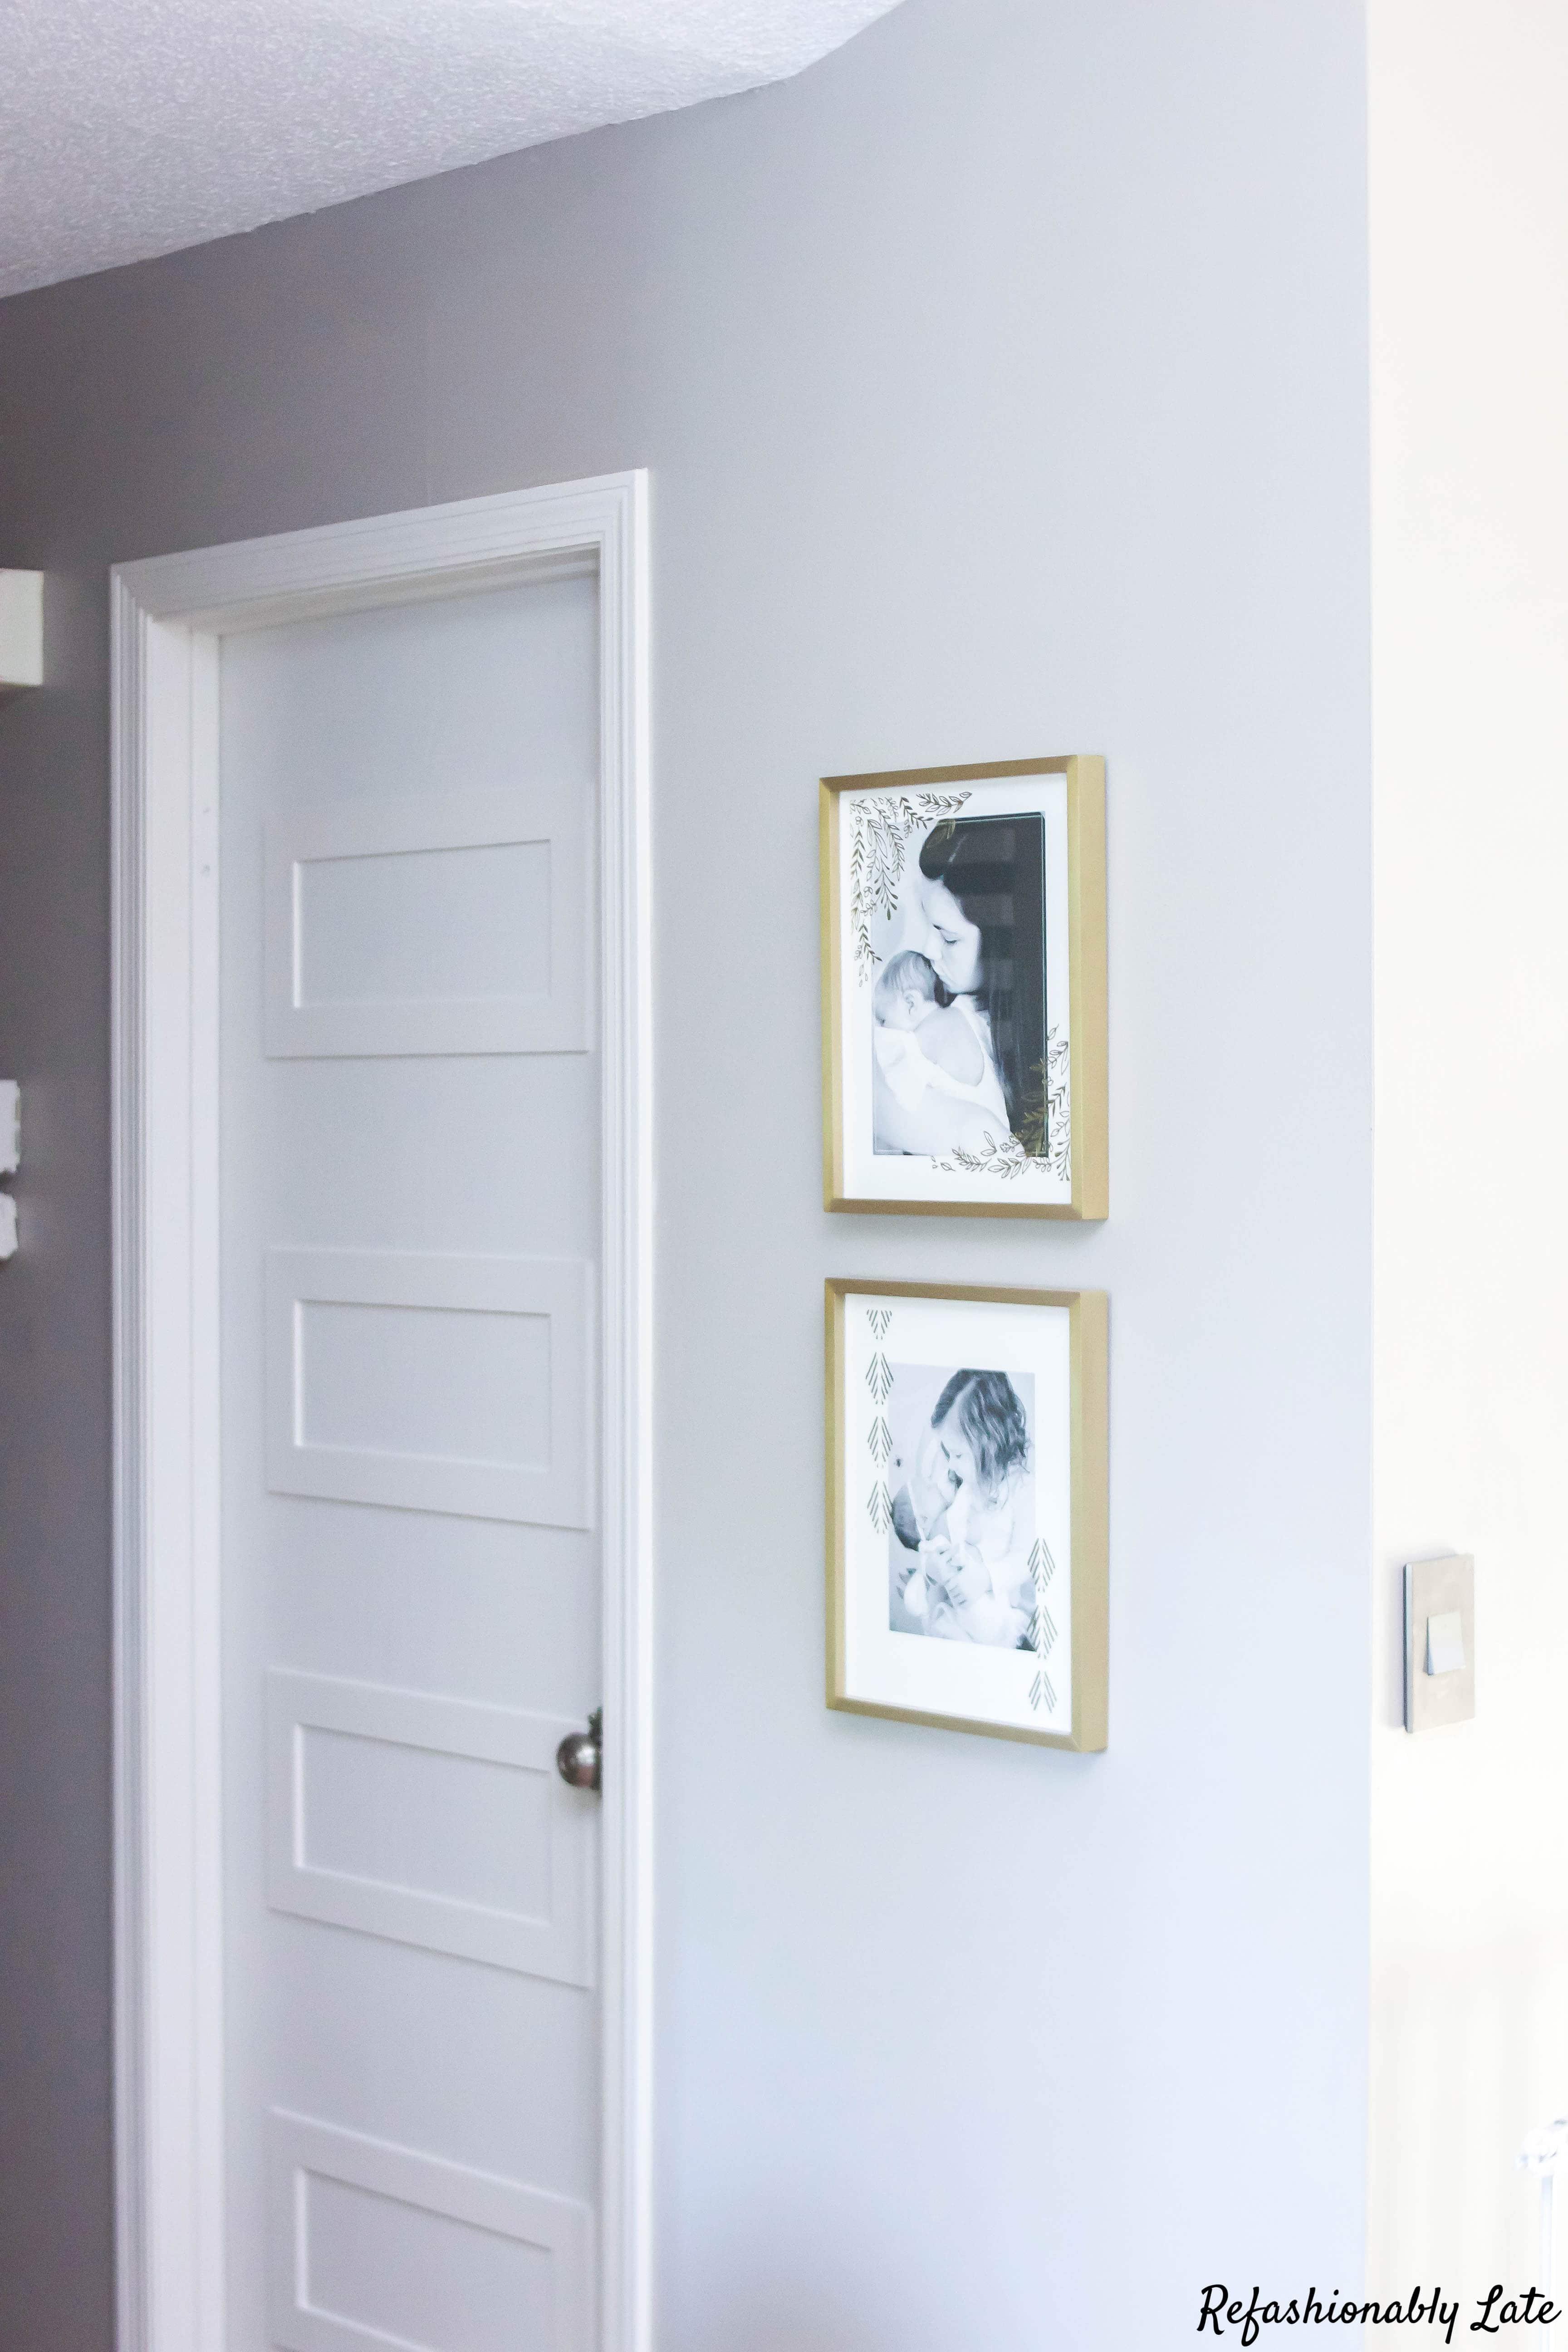 Stylish Diy Ways To Update Interior Doors The Creek Line